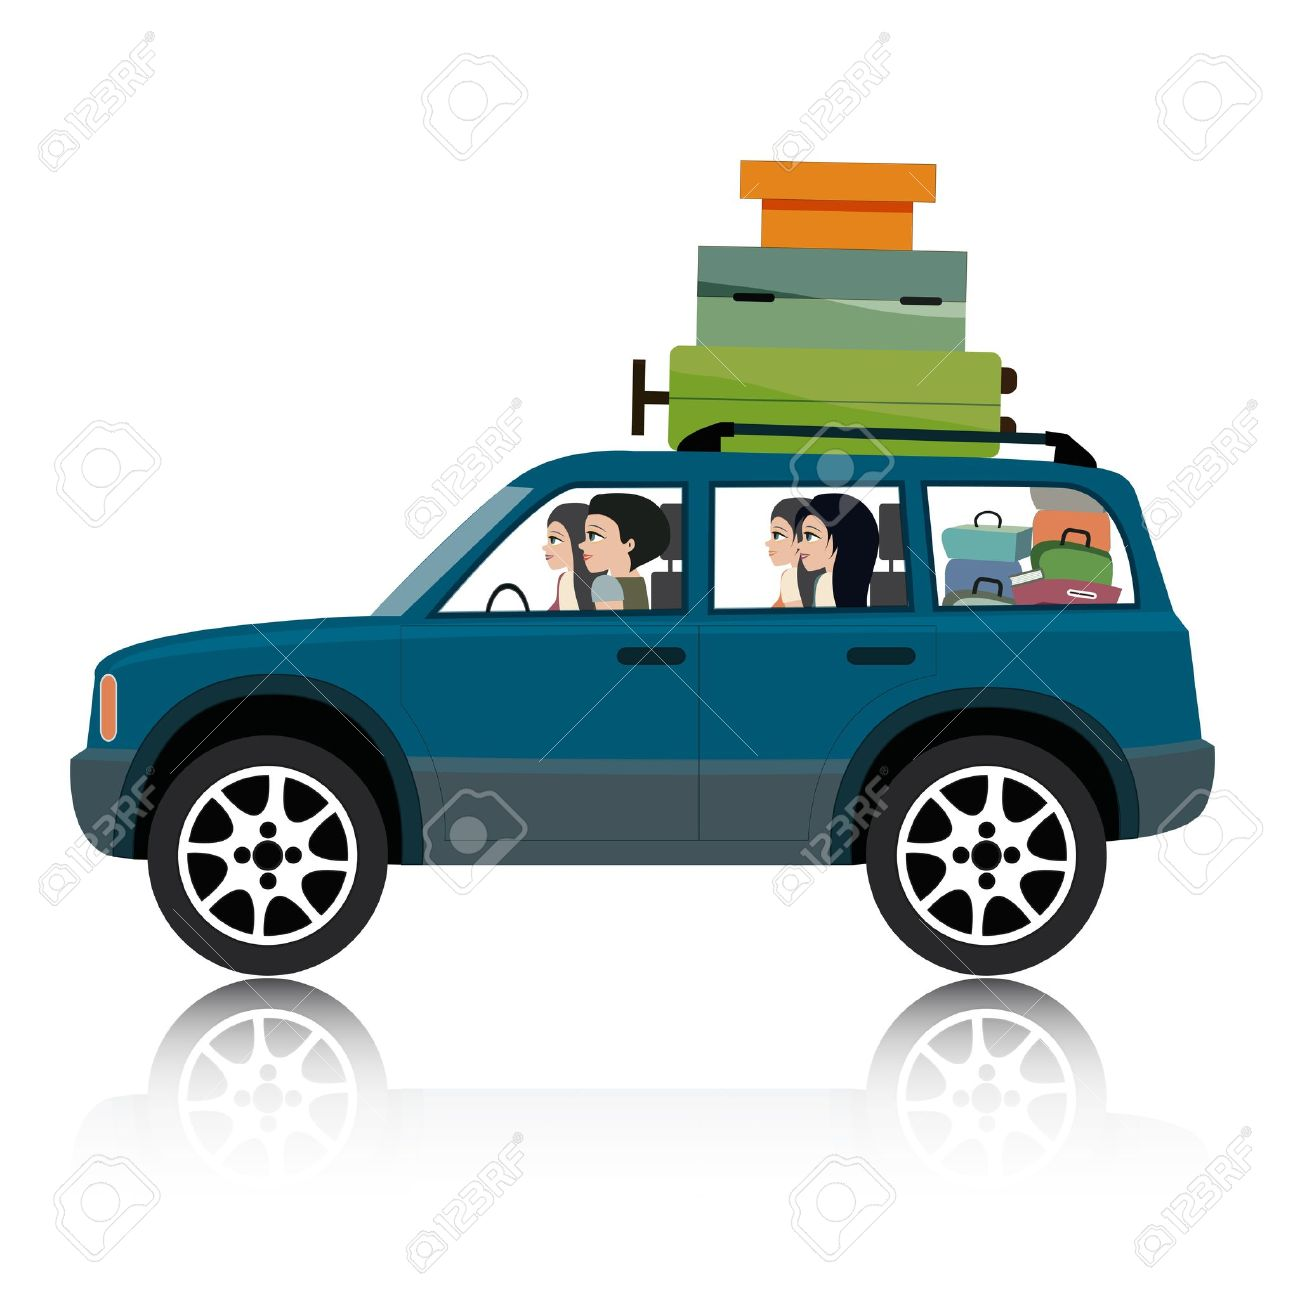 Women drive suv luggage - 21947568